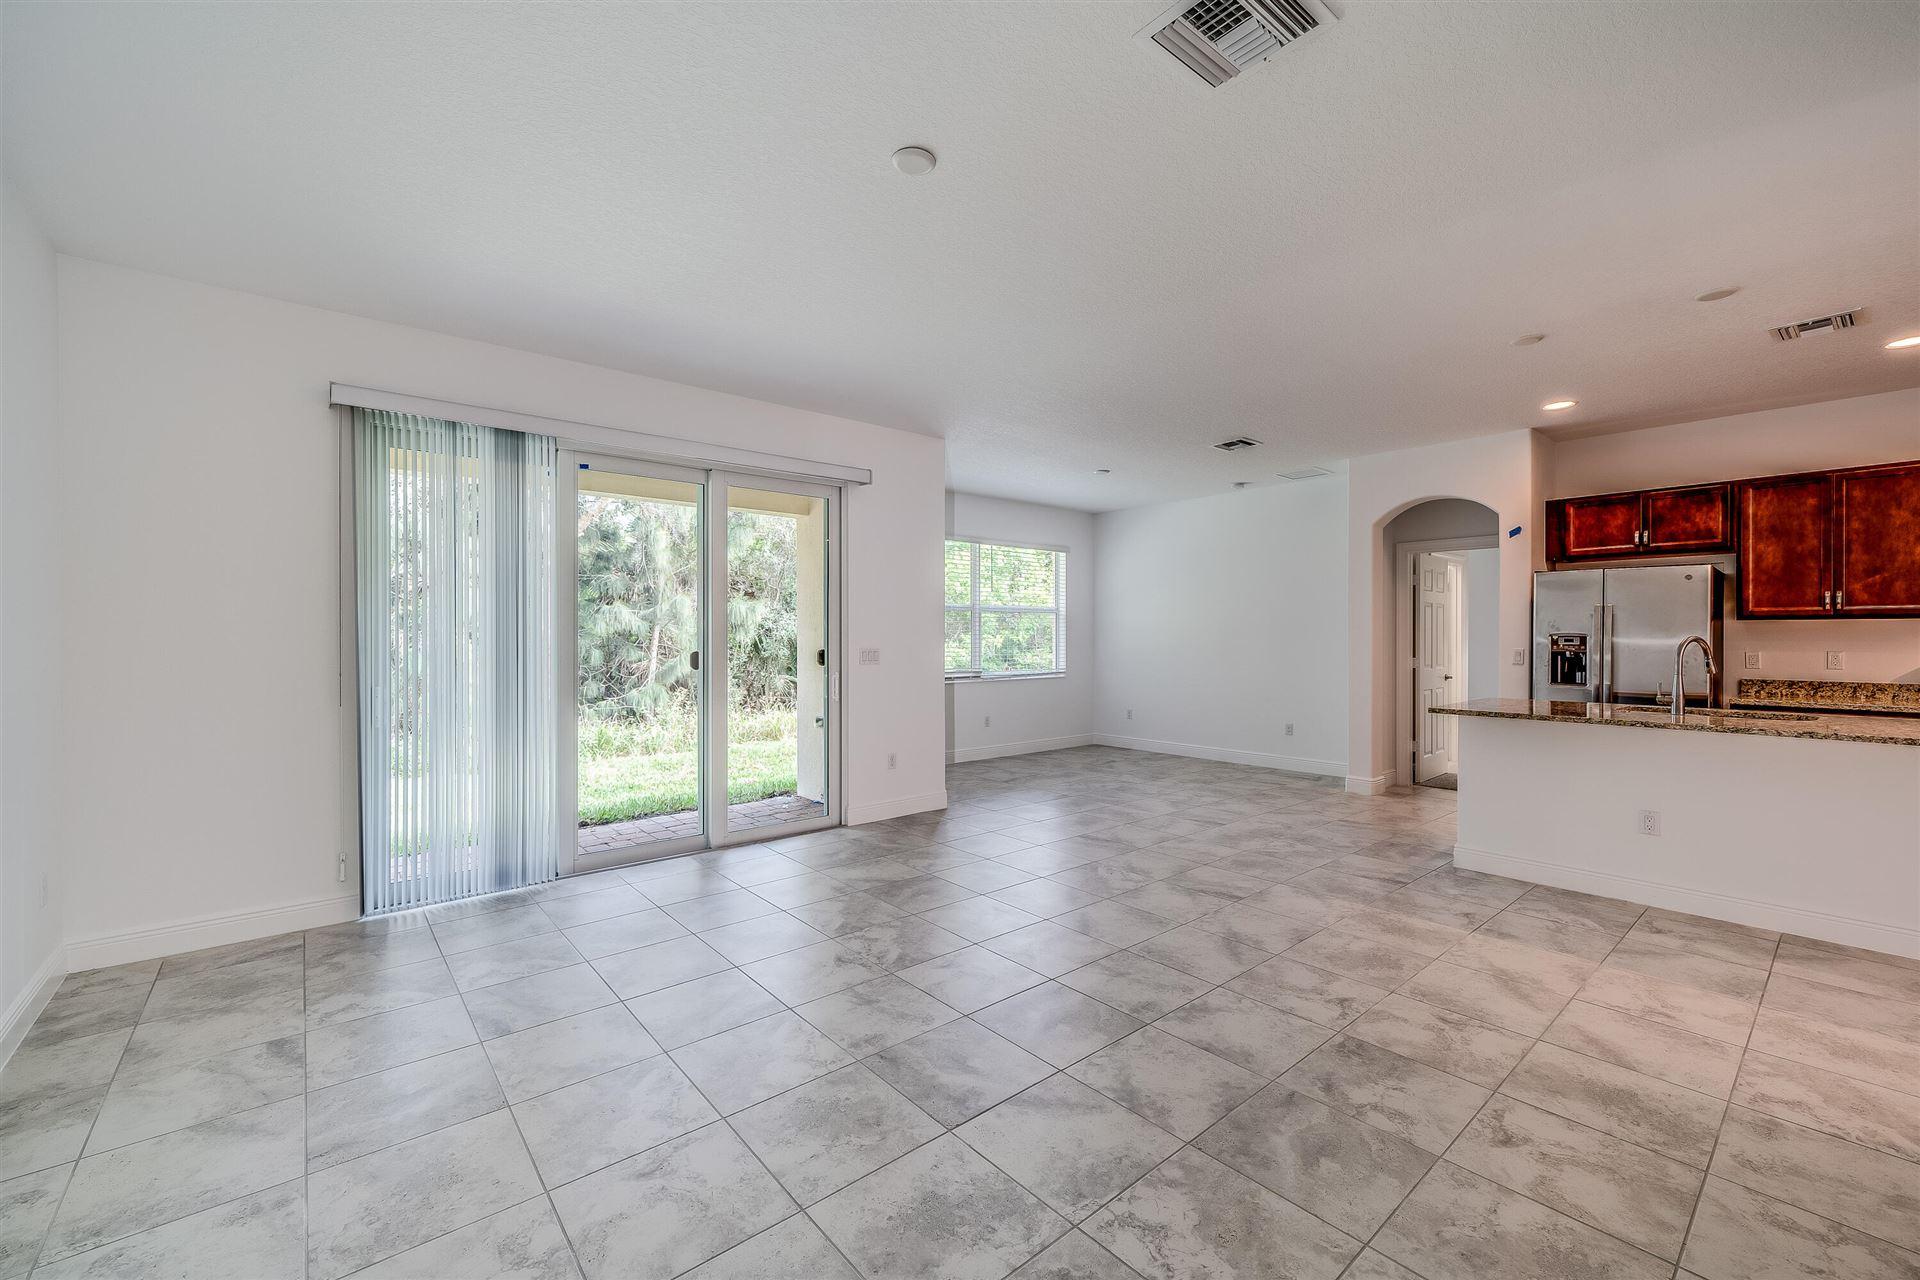 Photo of 1488 Whitmore Street, Sebastian, FL 32958 (MLS # RX-10742627)